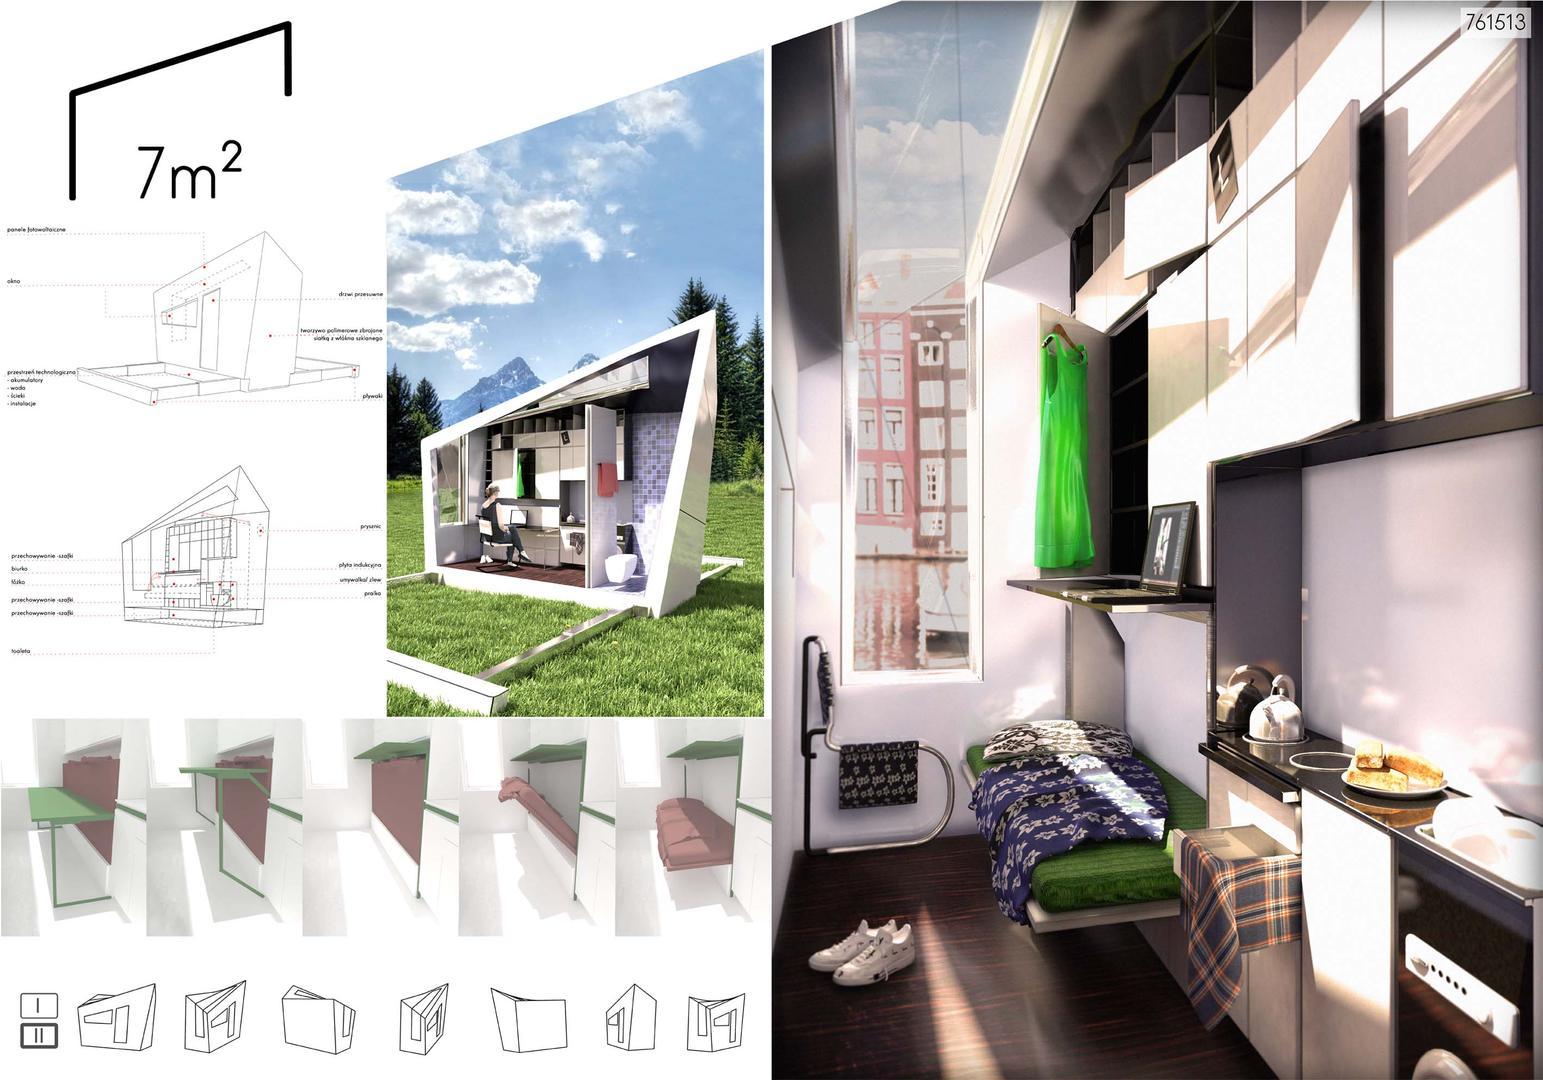 Jednostka Mieszkalna Minimum Projekt Architektura Murator